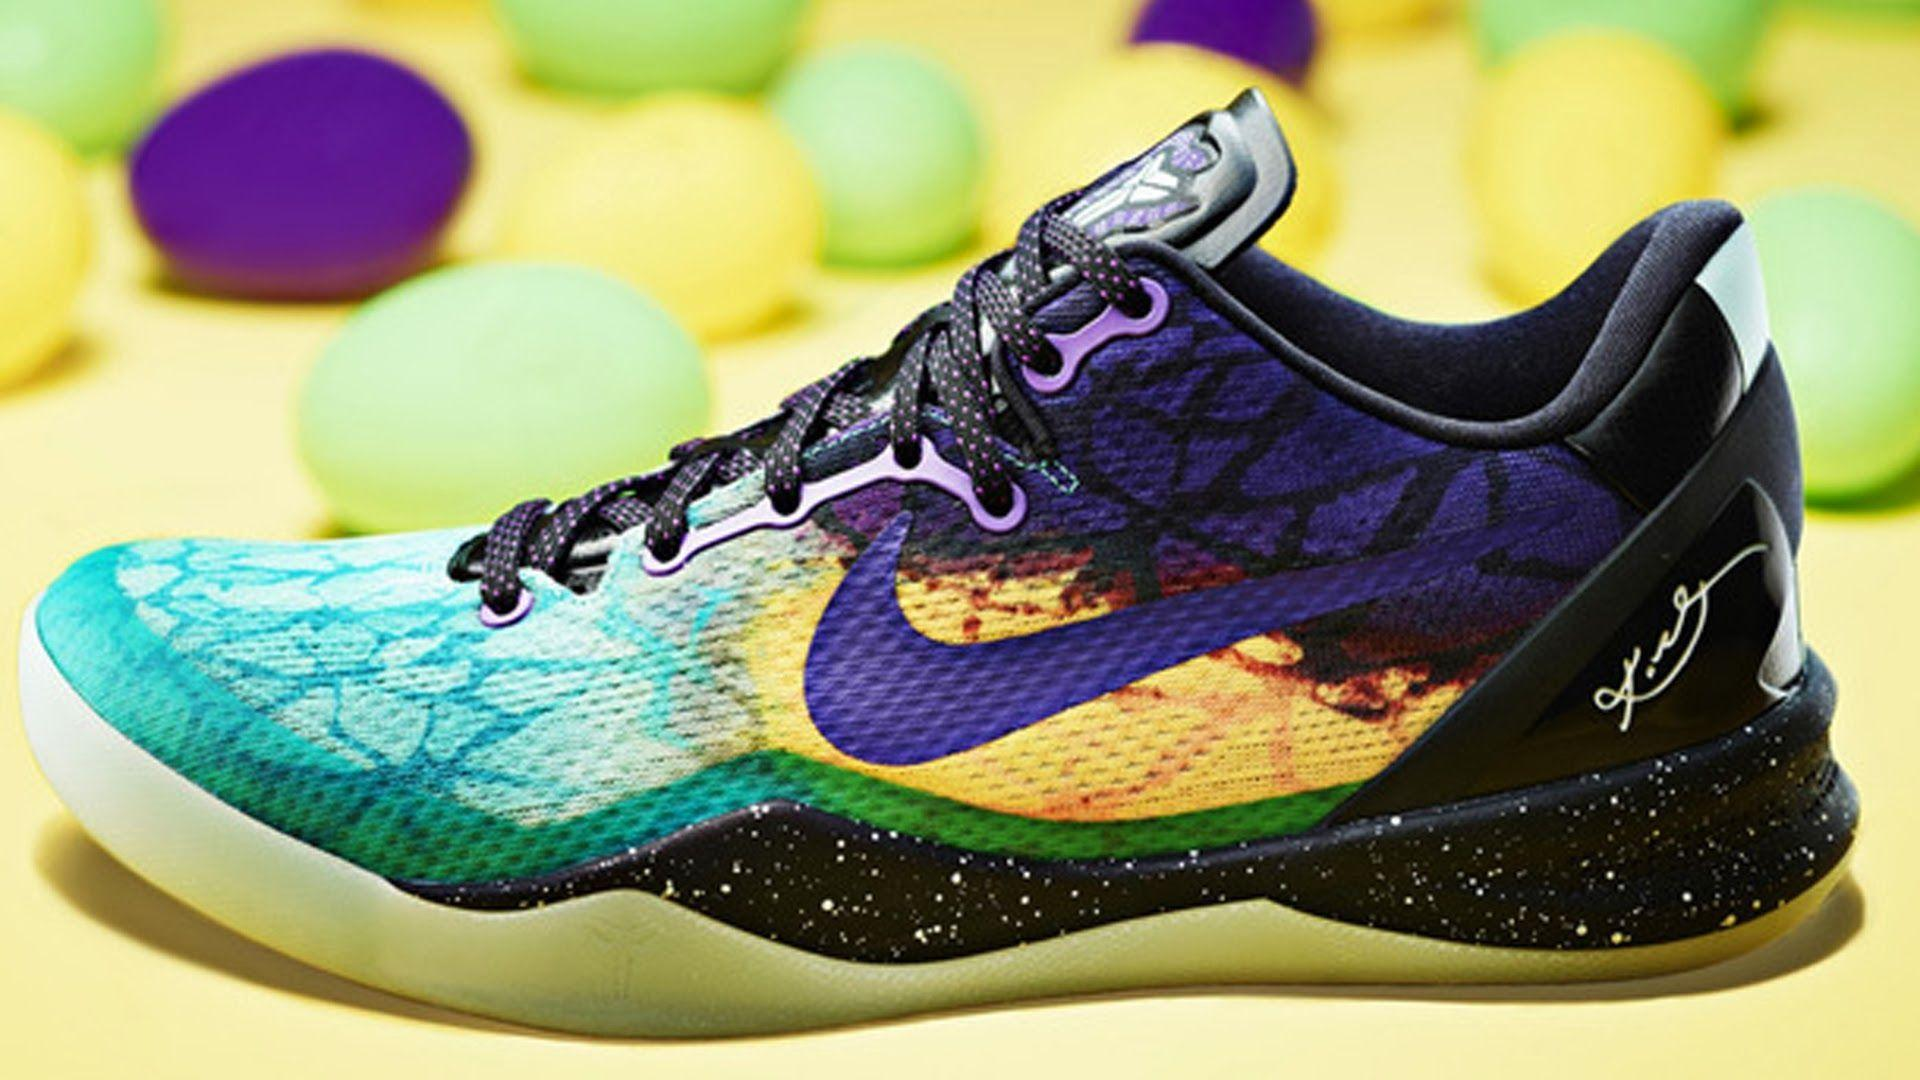 Nike Kobe Easter Shoes